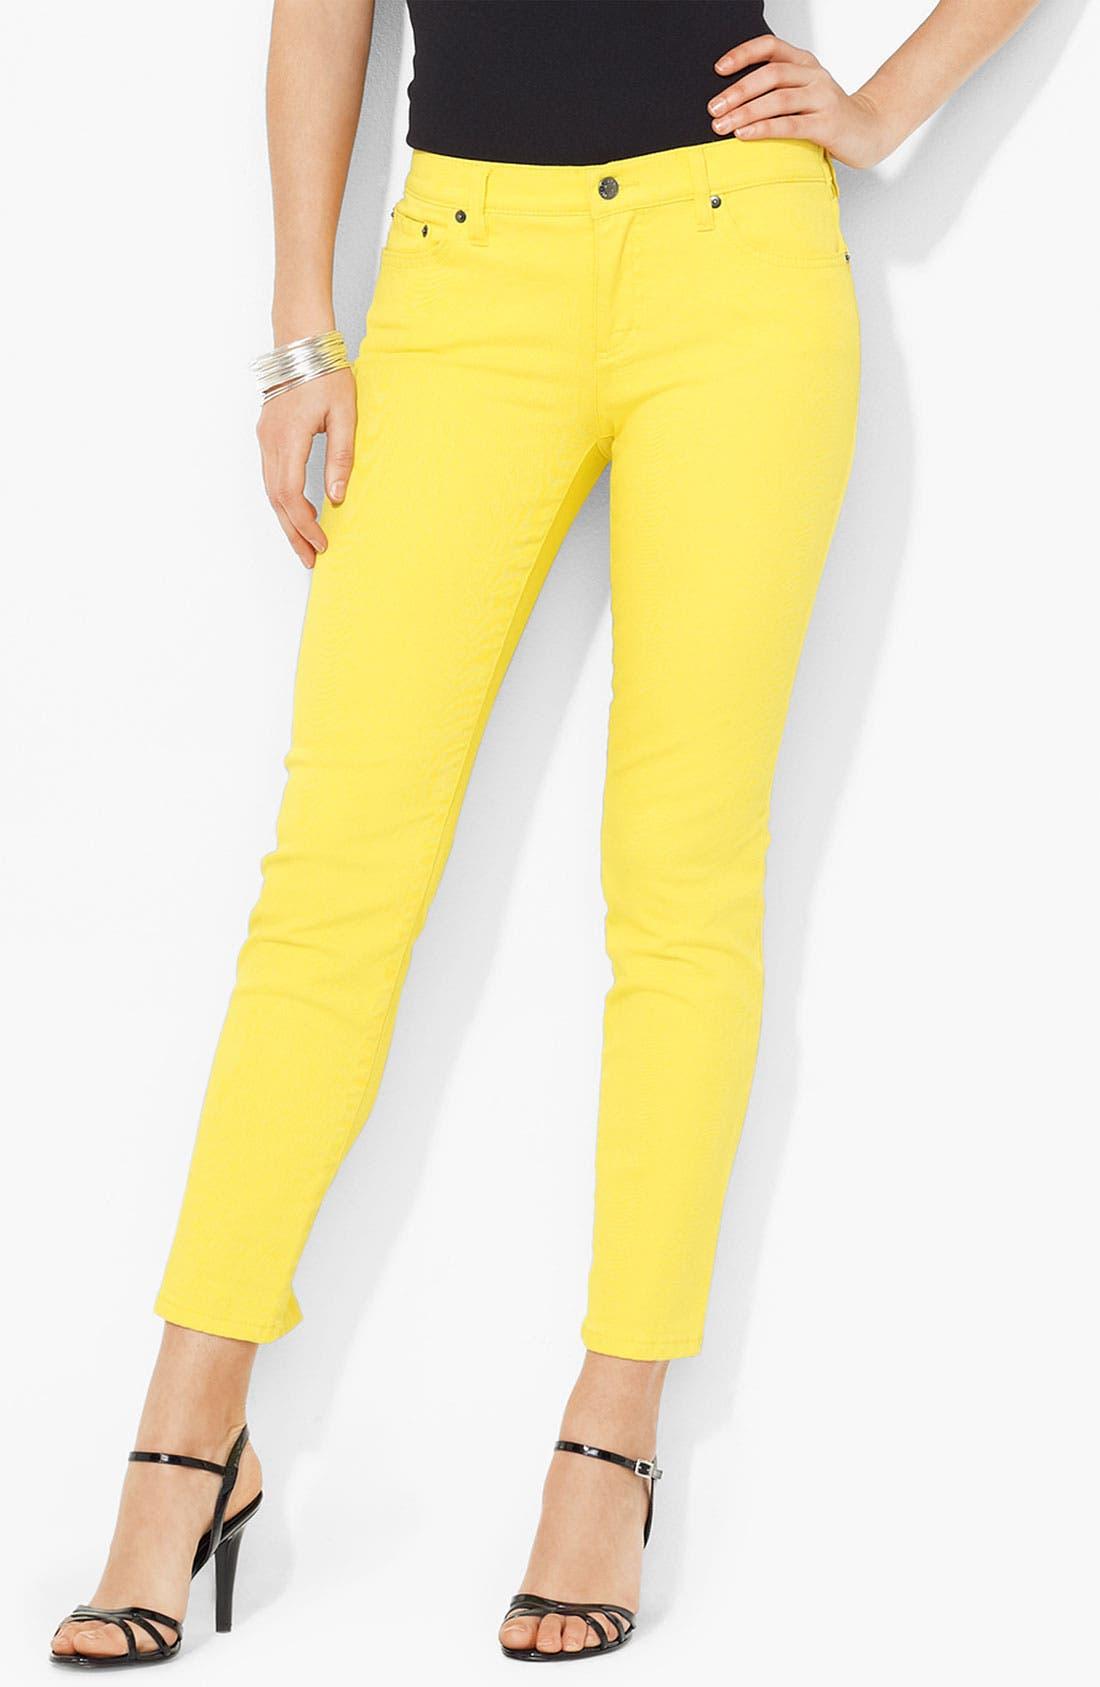 Alternate Image 1 Selected - Lauren Ralph Lauren Slimming Straight Leg Ankle Pants (Petite) (Online Exclusive)